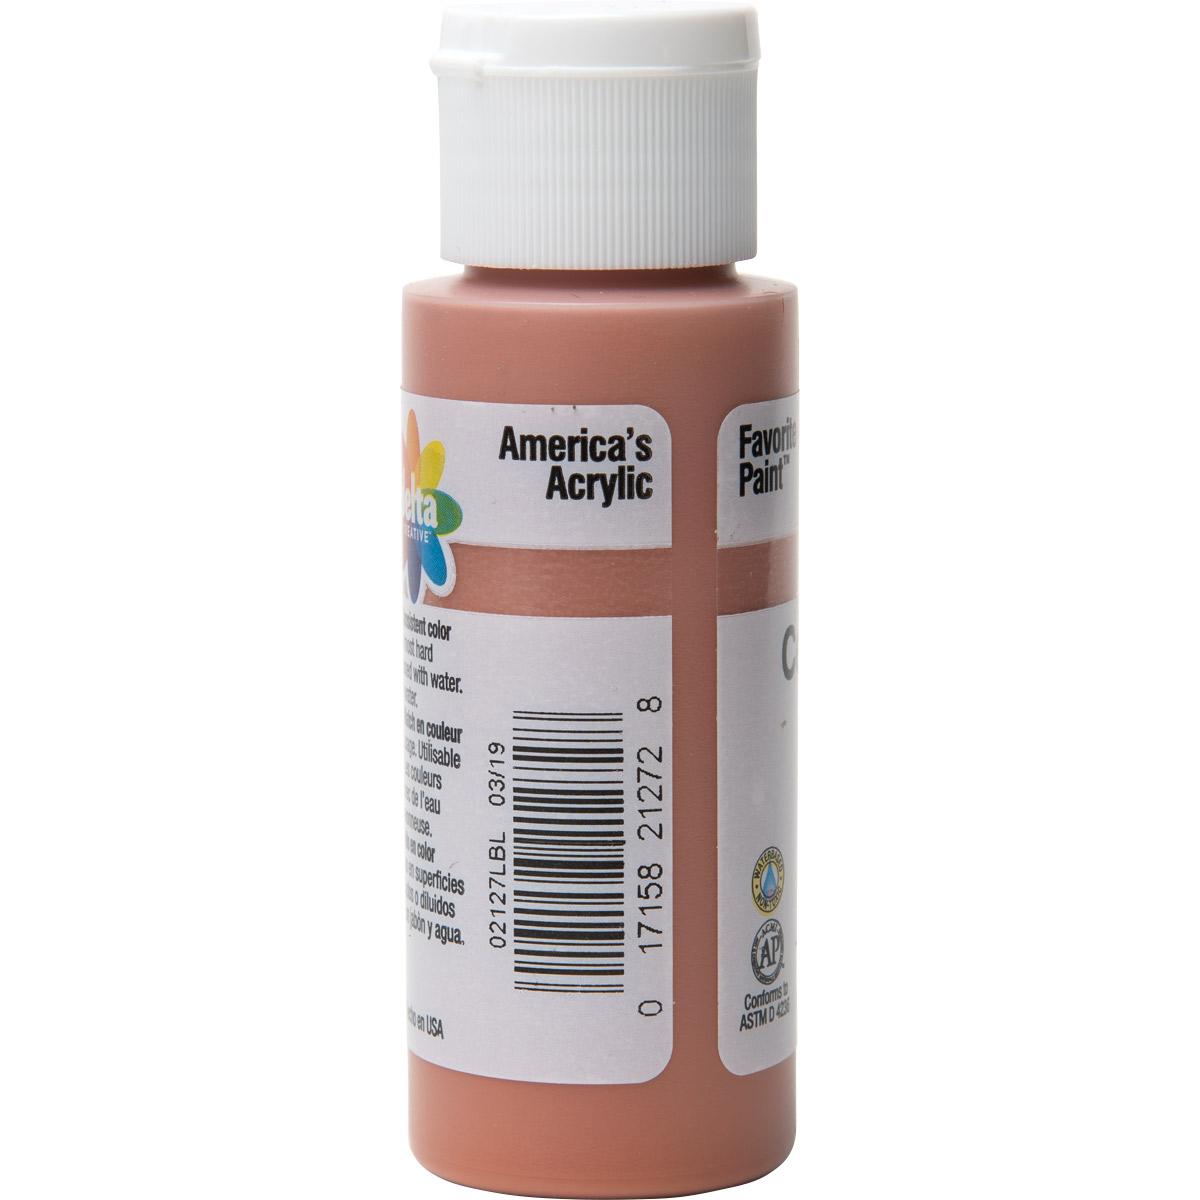 Delta Ceramcoat ® Acrylic Paint - Tawny, 2 oz. - 021270202W